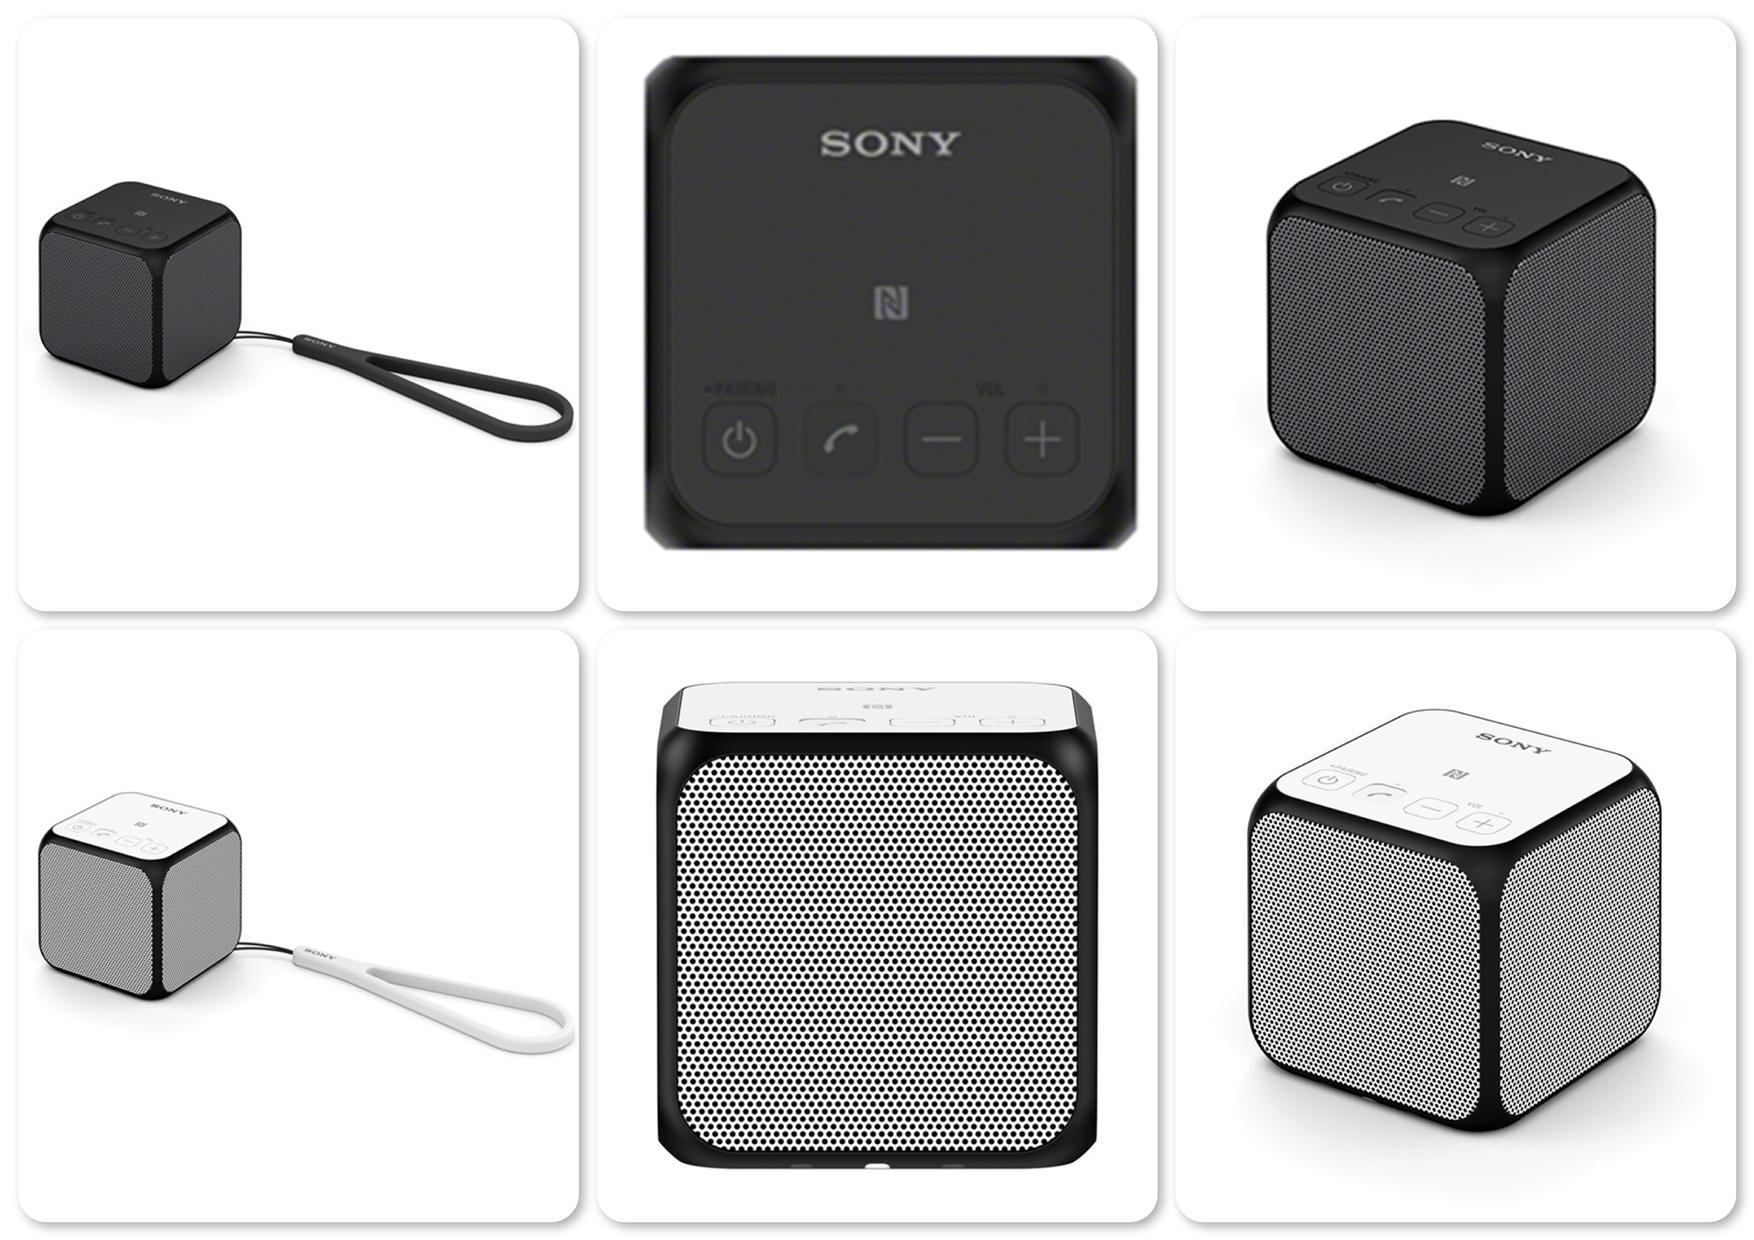 sony ultra portable bluetooth speaker. bdotcom \u003d sony srs - x11 portable bluetooth speaker original ultra